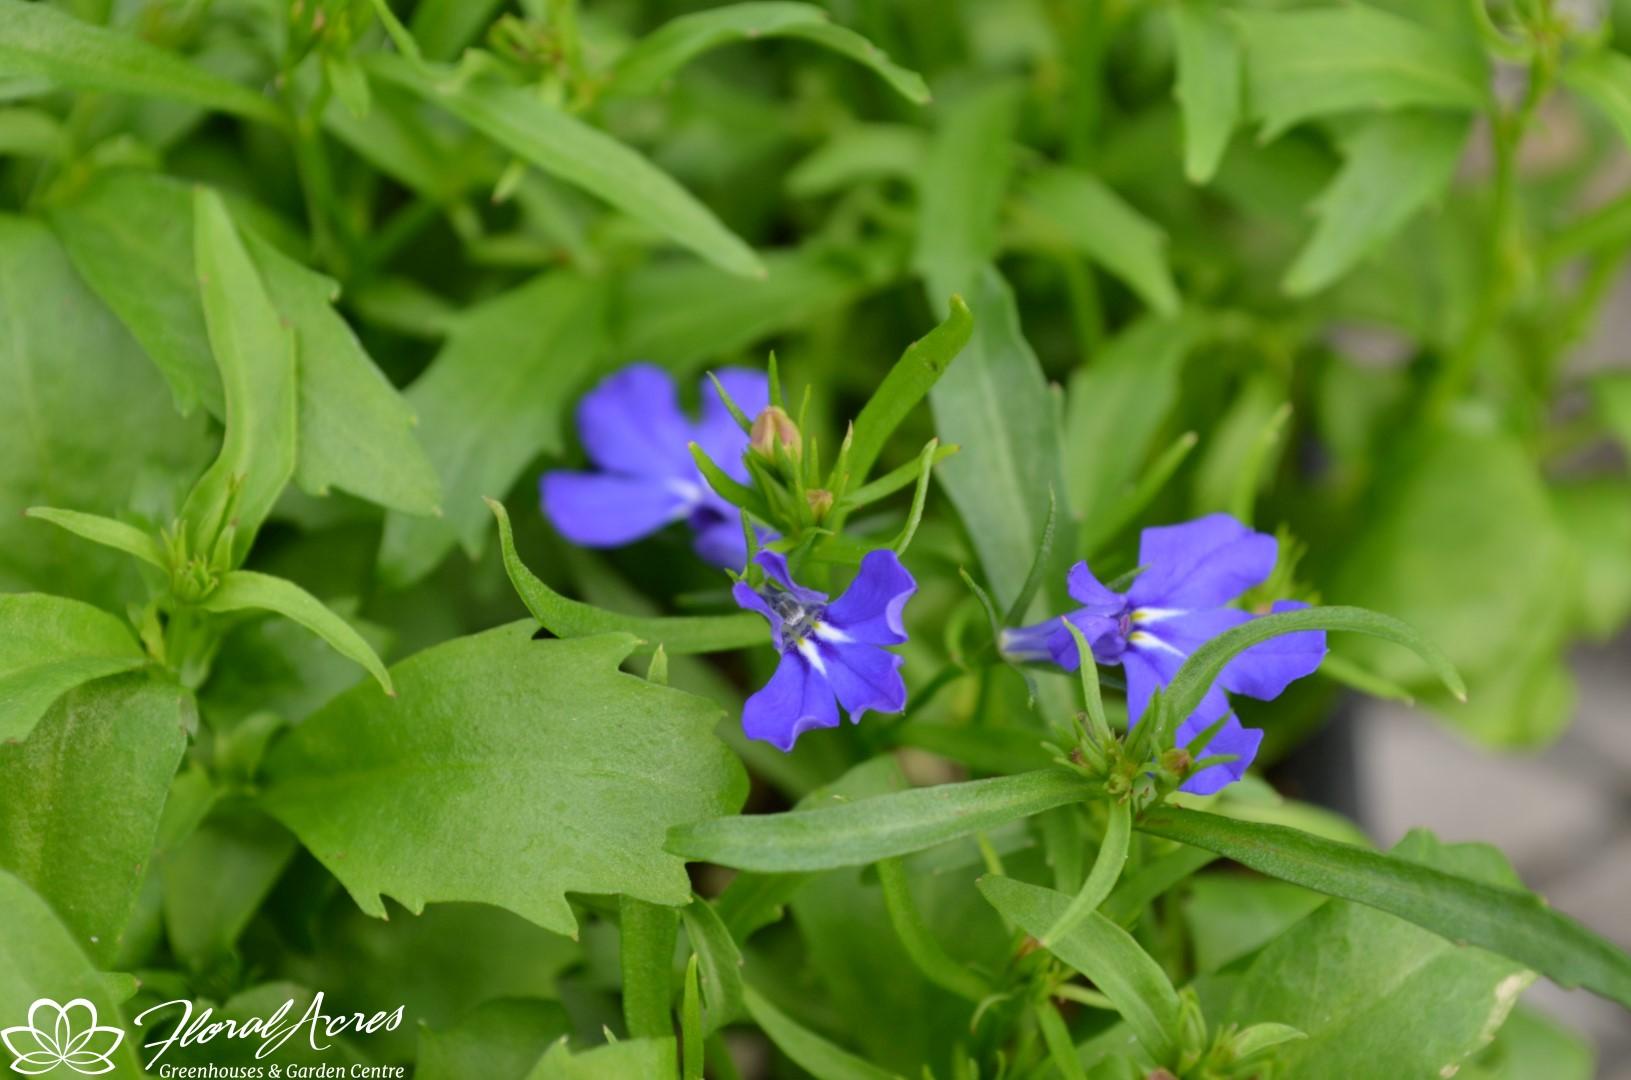 Lobelia Riviera Marine Blue Compact Floral Acres